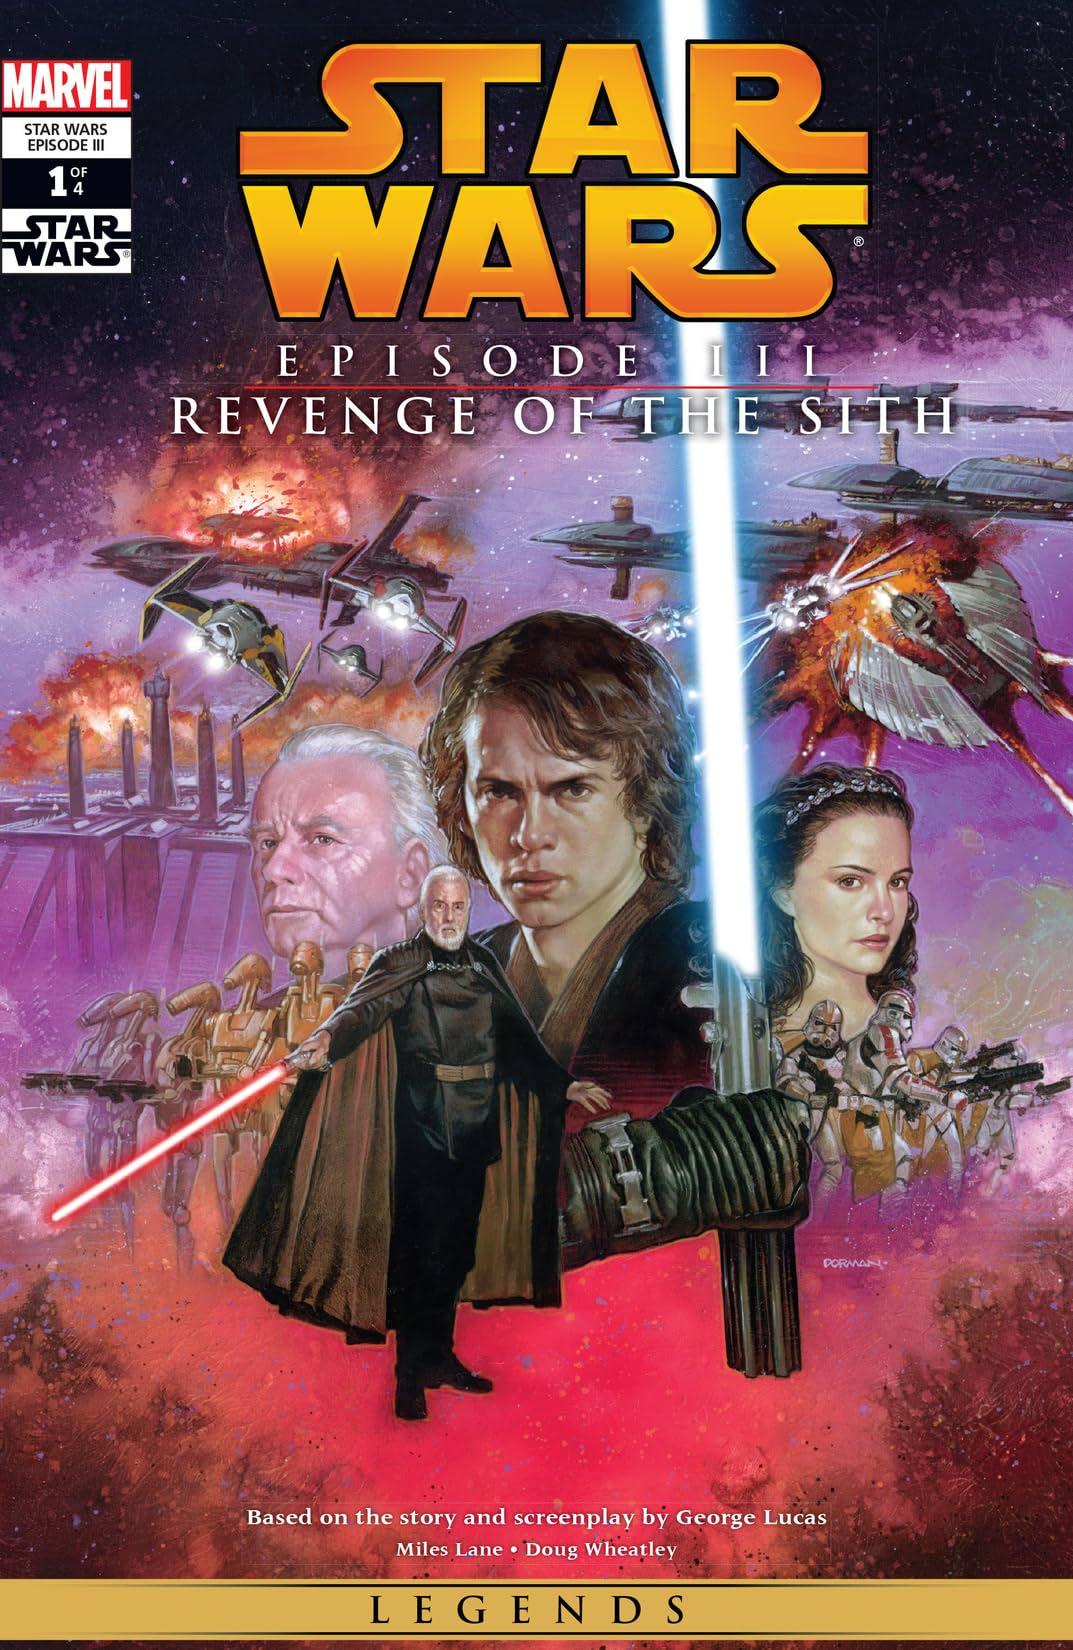 Star Wars Episode Iii Revenge Of The Sith 2005 1 Of 4 Eu Comics By Comixology